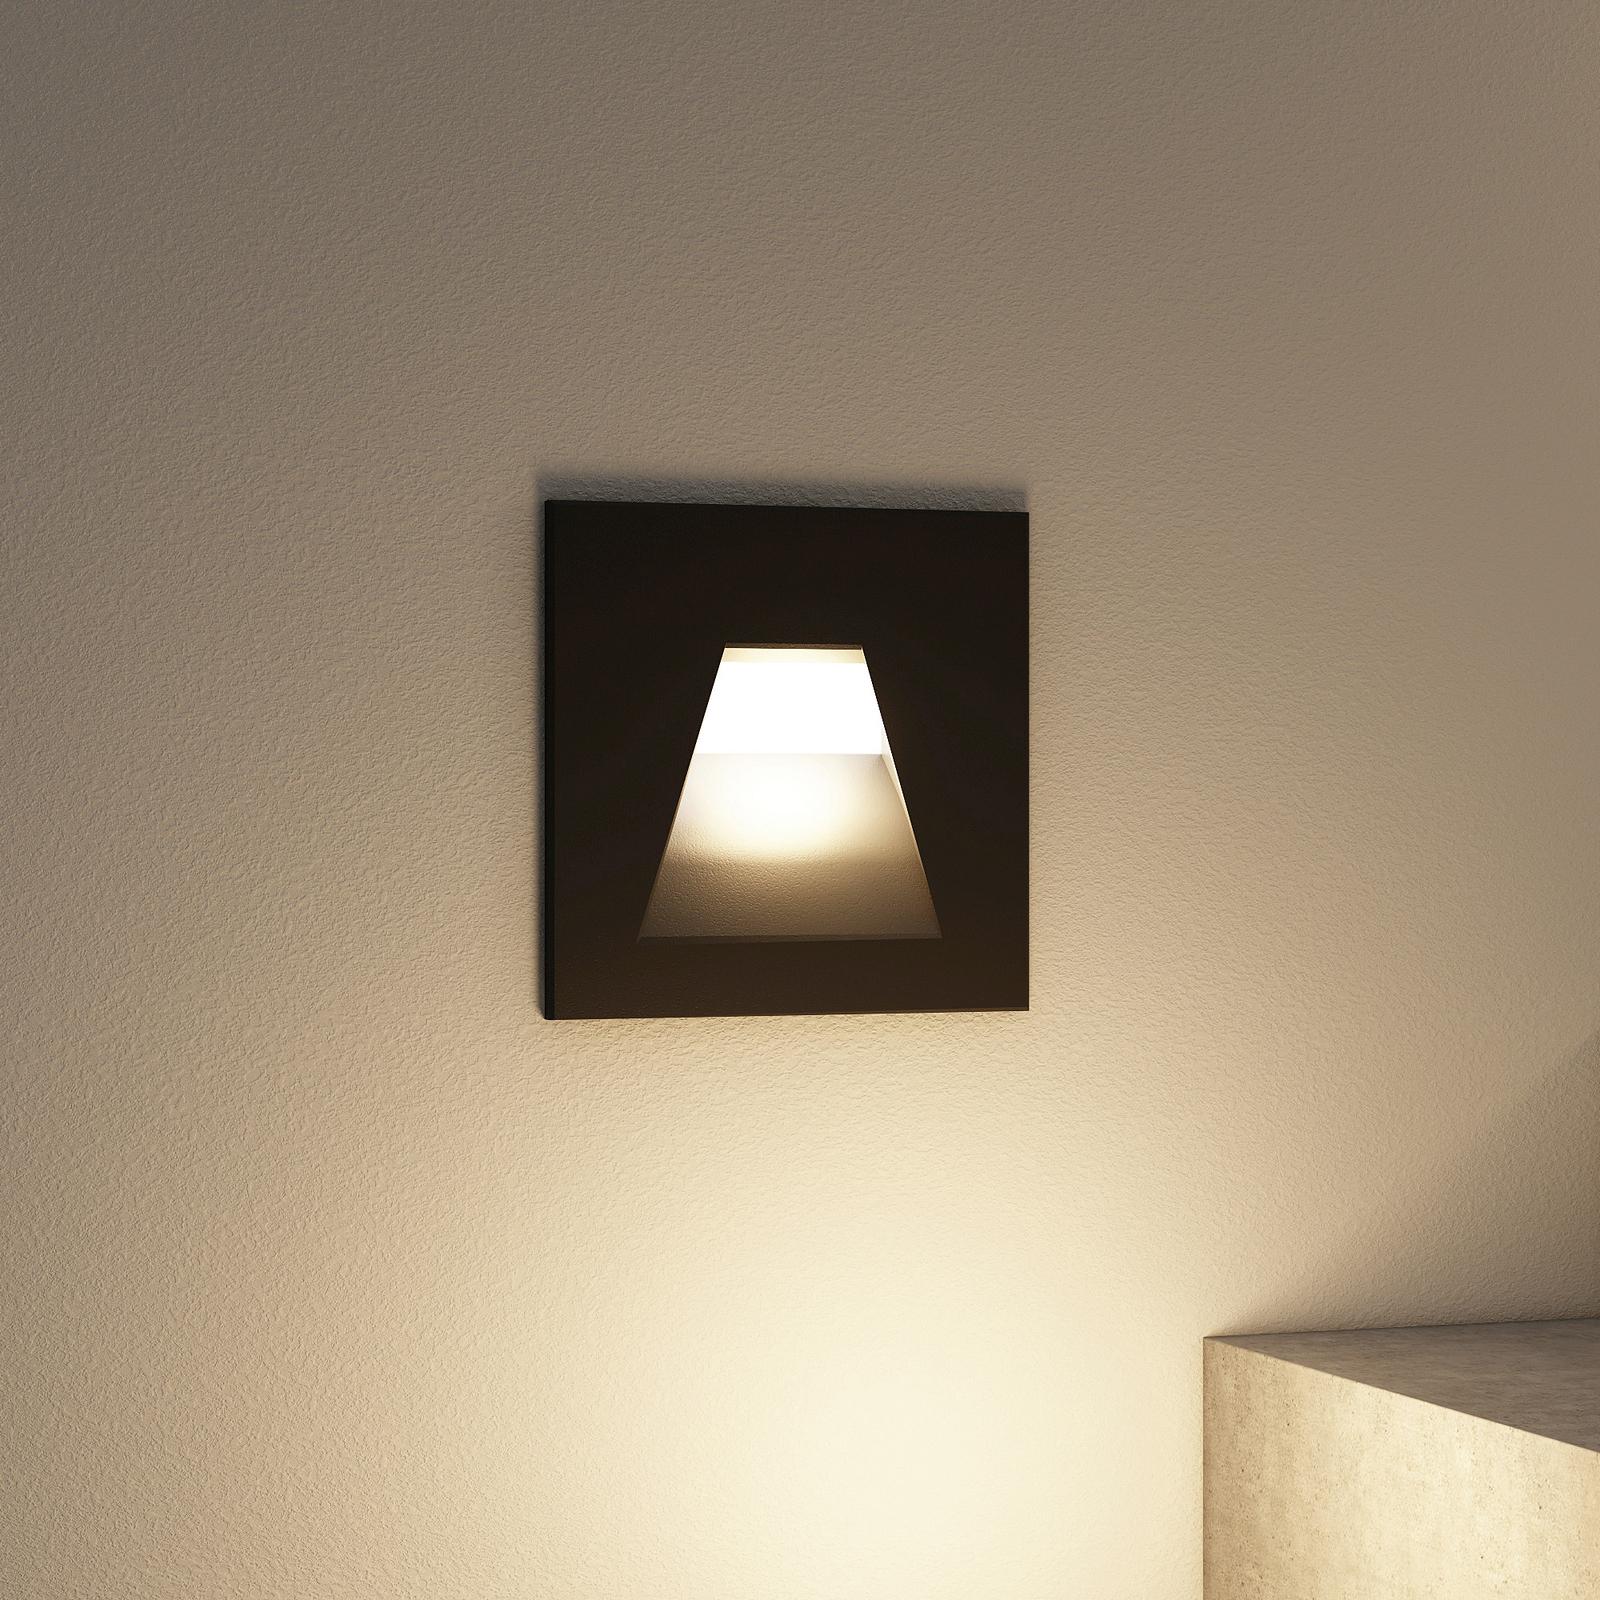 Arcchio Lasca LED-Einbauleuchte, schwarz